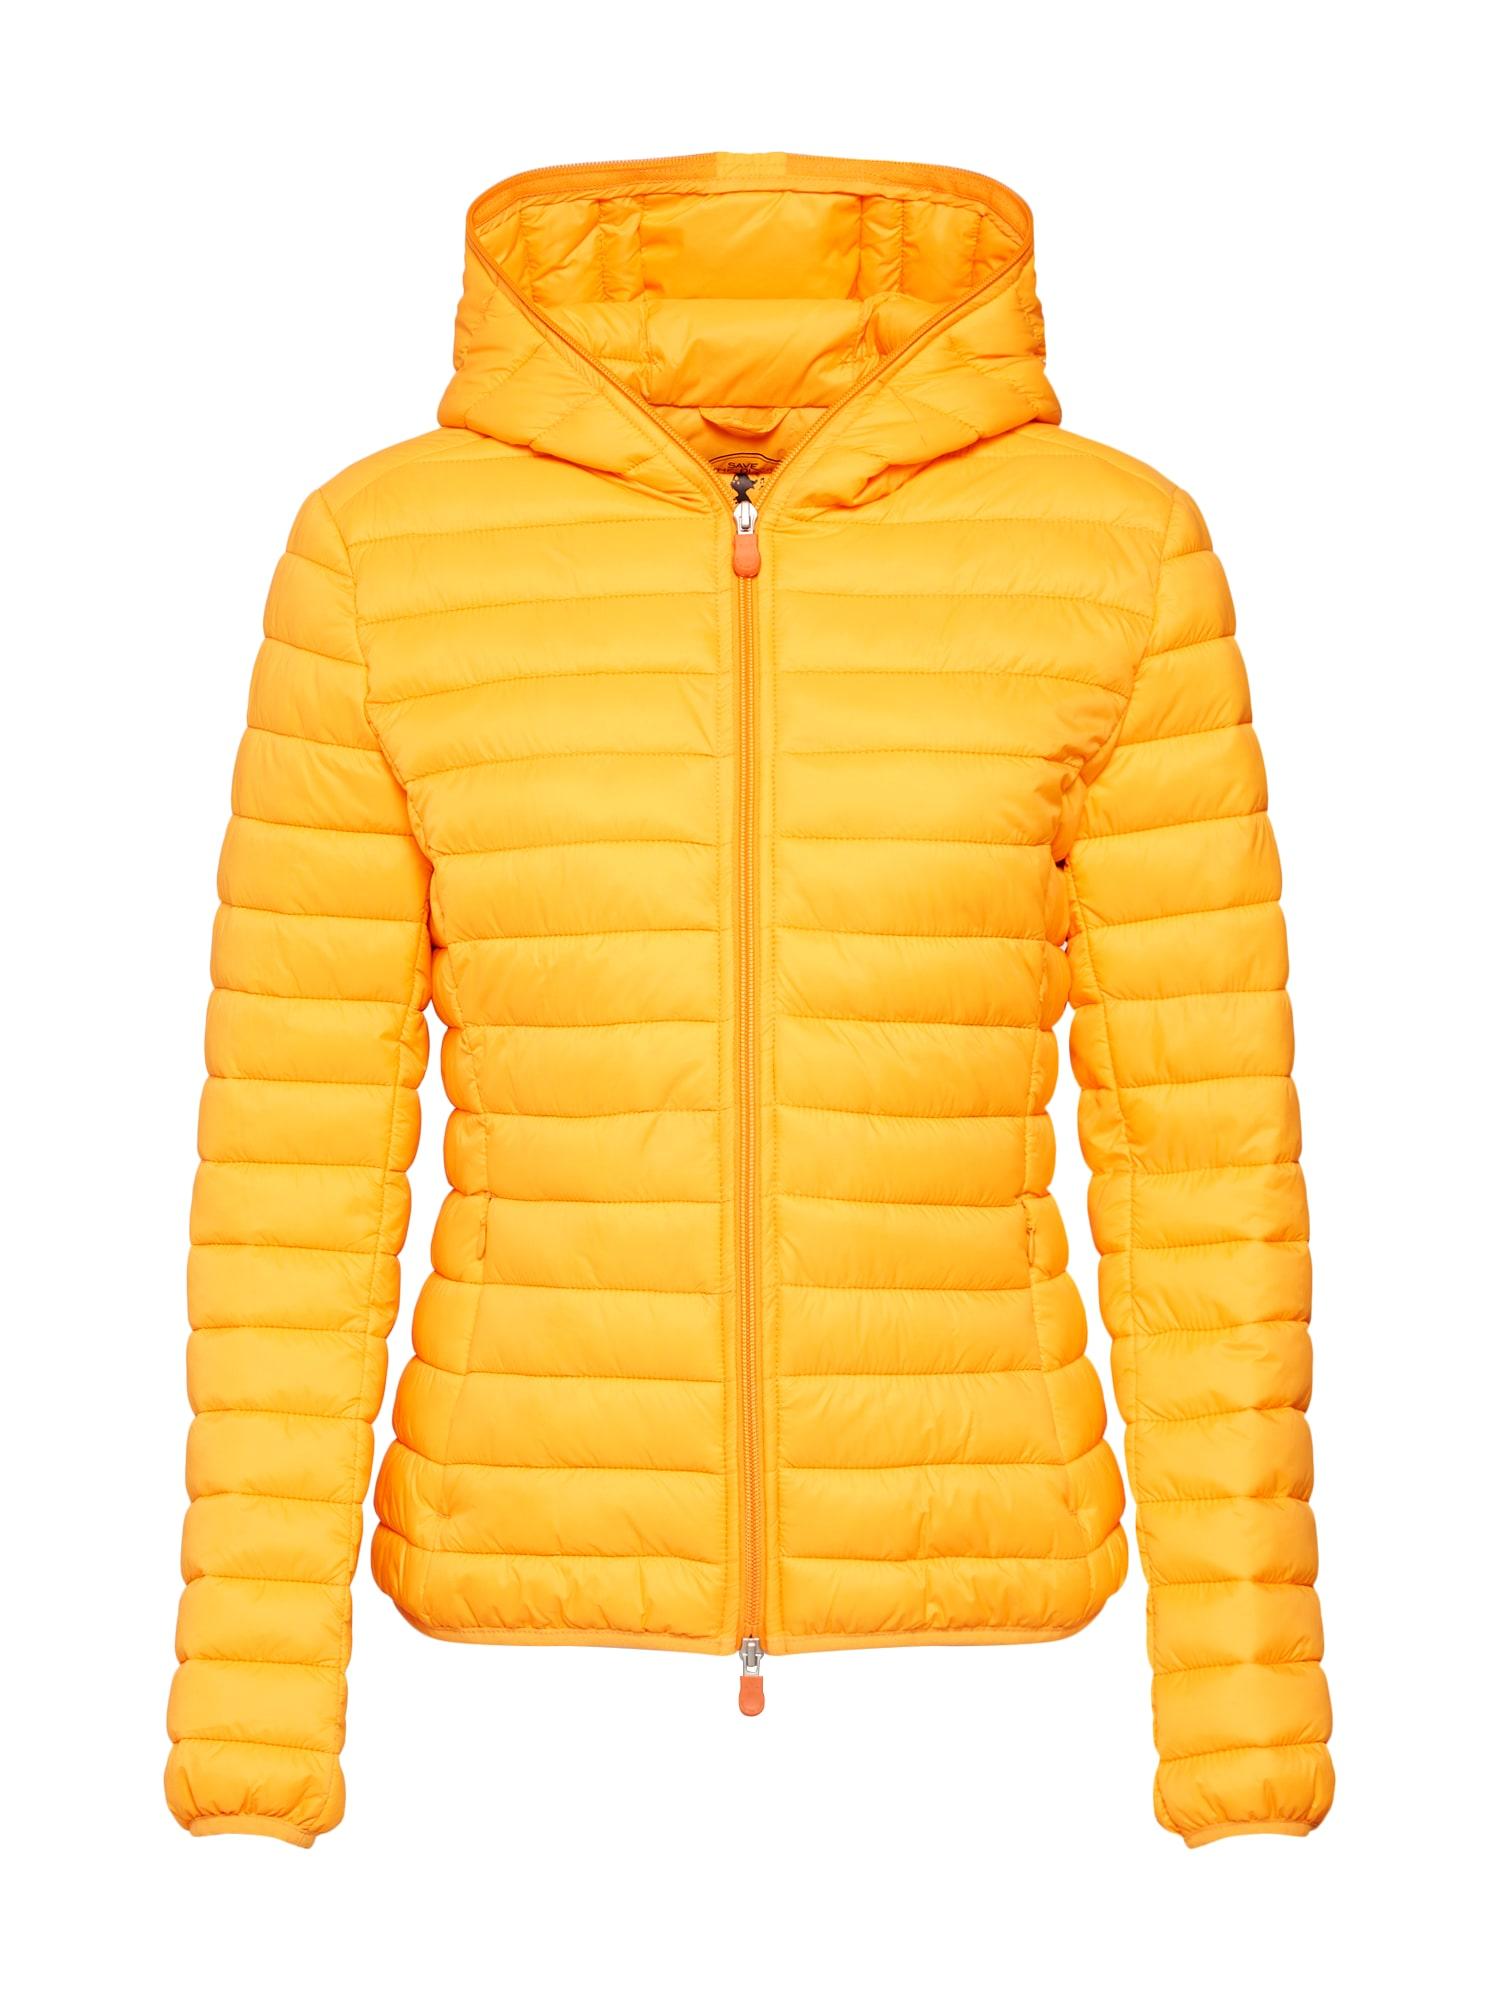 Zimní bunda GIUBBOTTO CAPPUCCIO oranžová SAVE THE DUCK